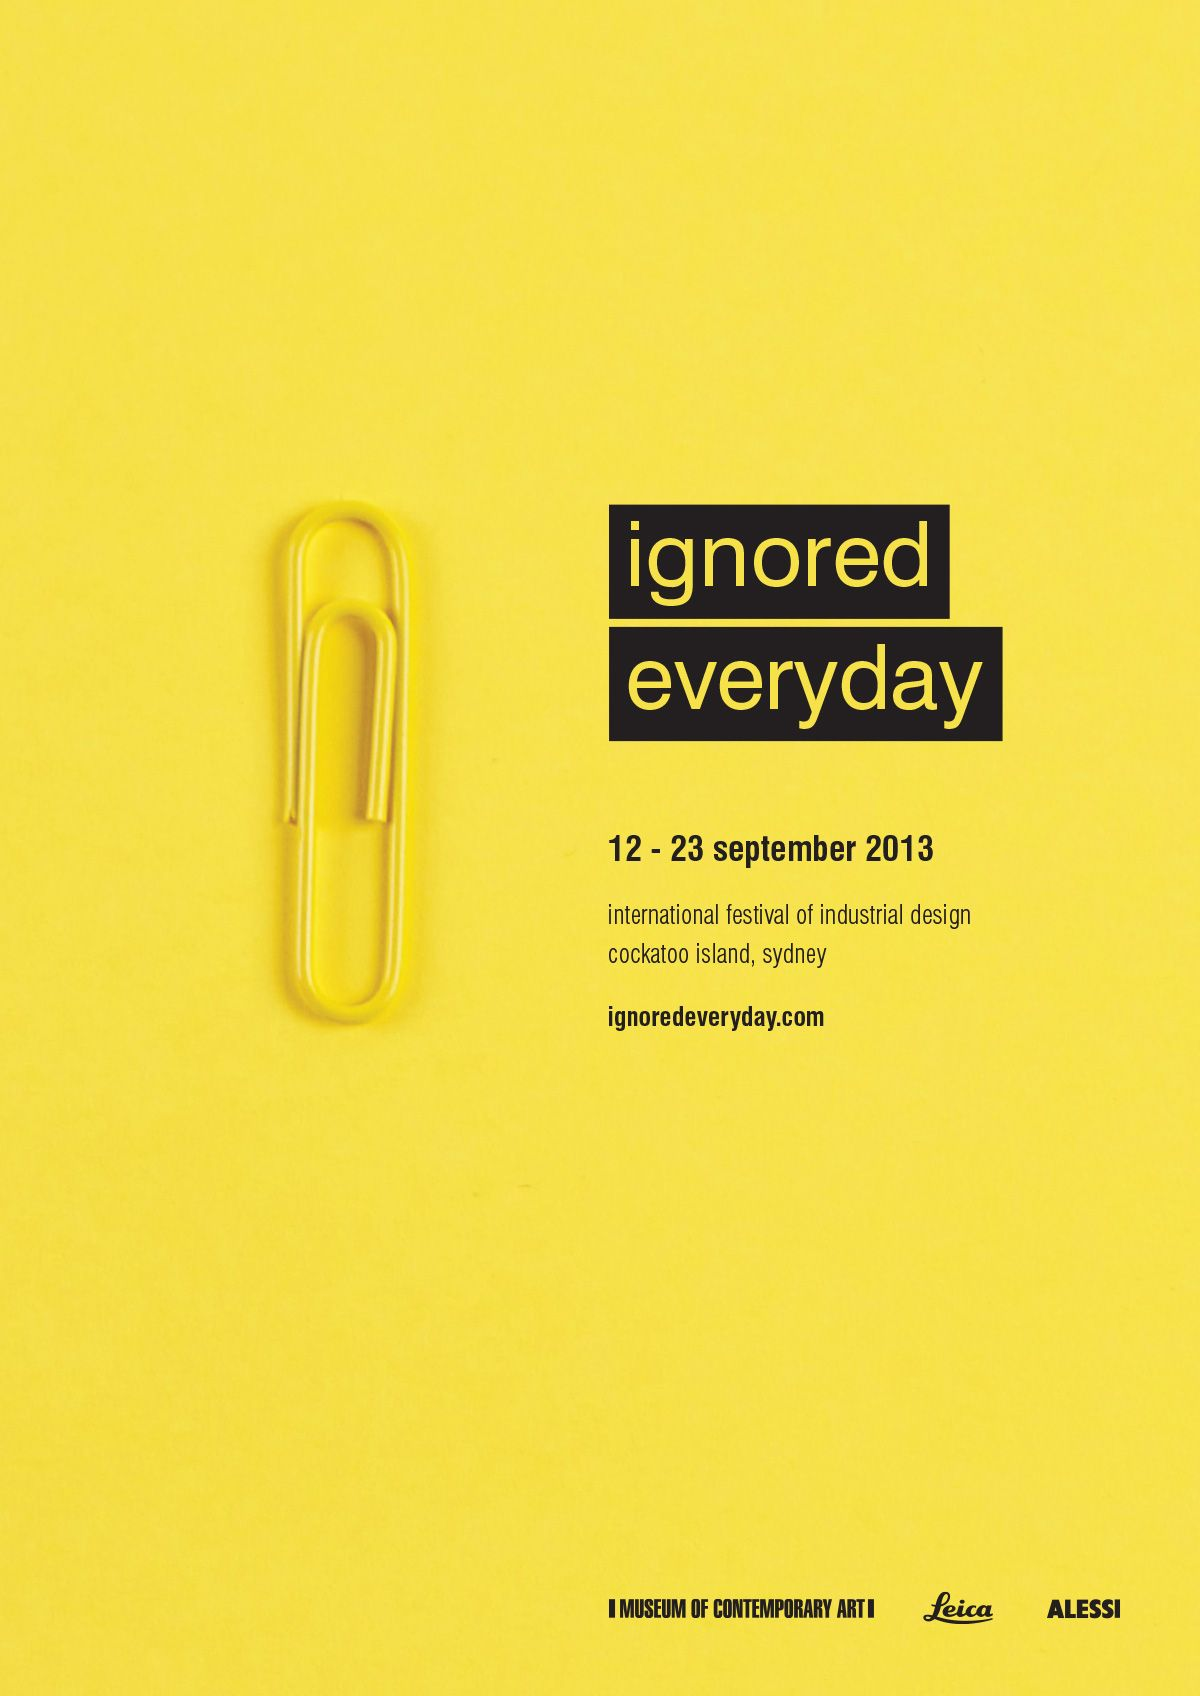 Ignored Everyday Industrial Design Festival Campaign #industridesign